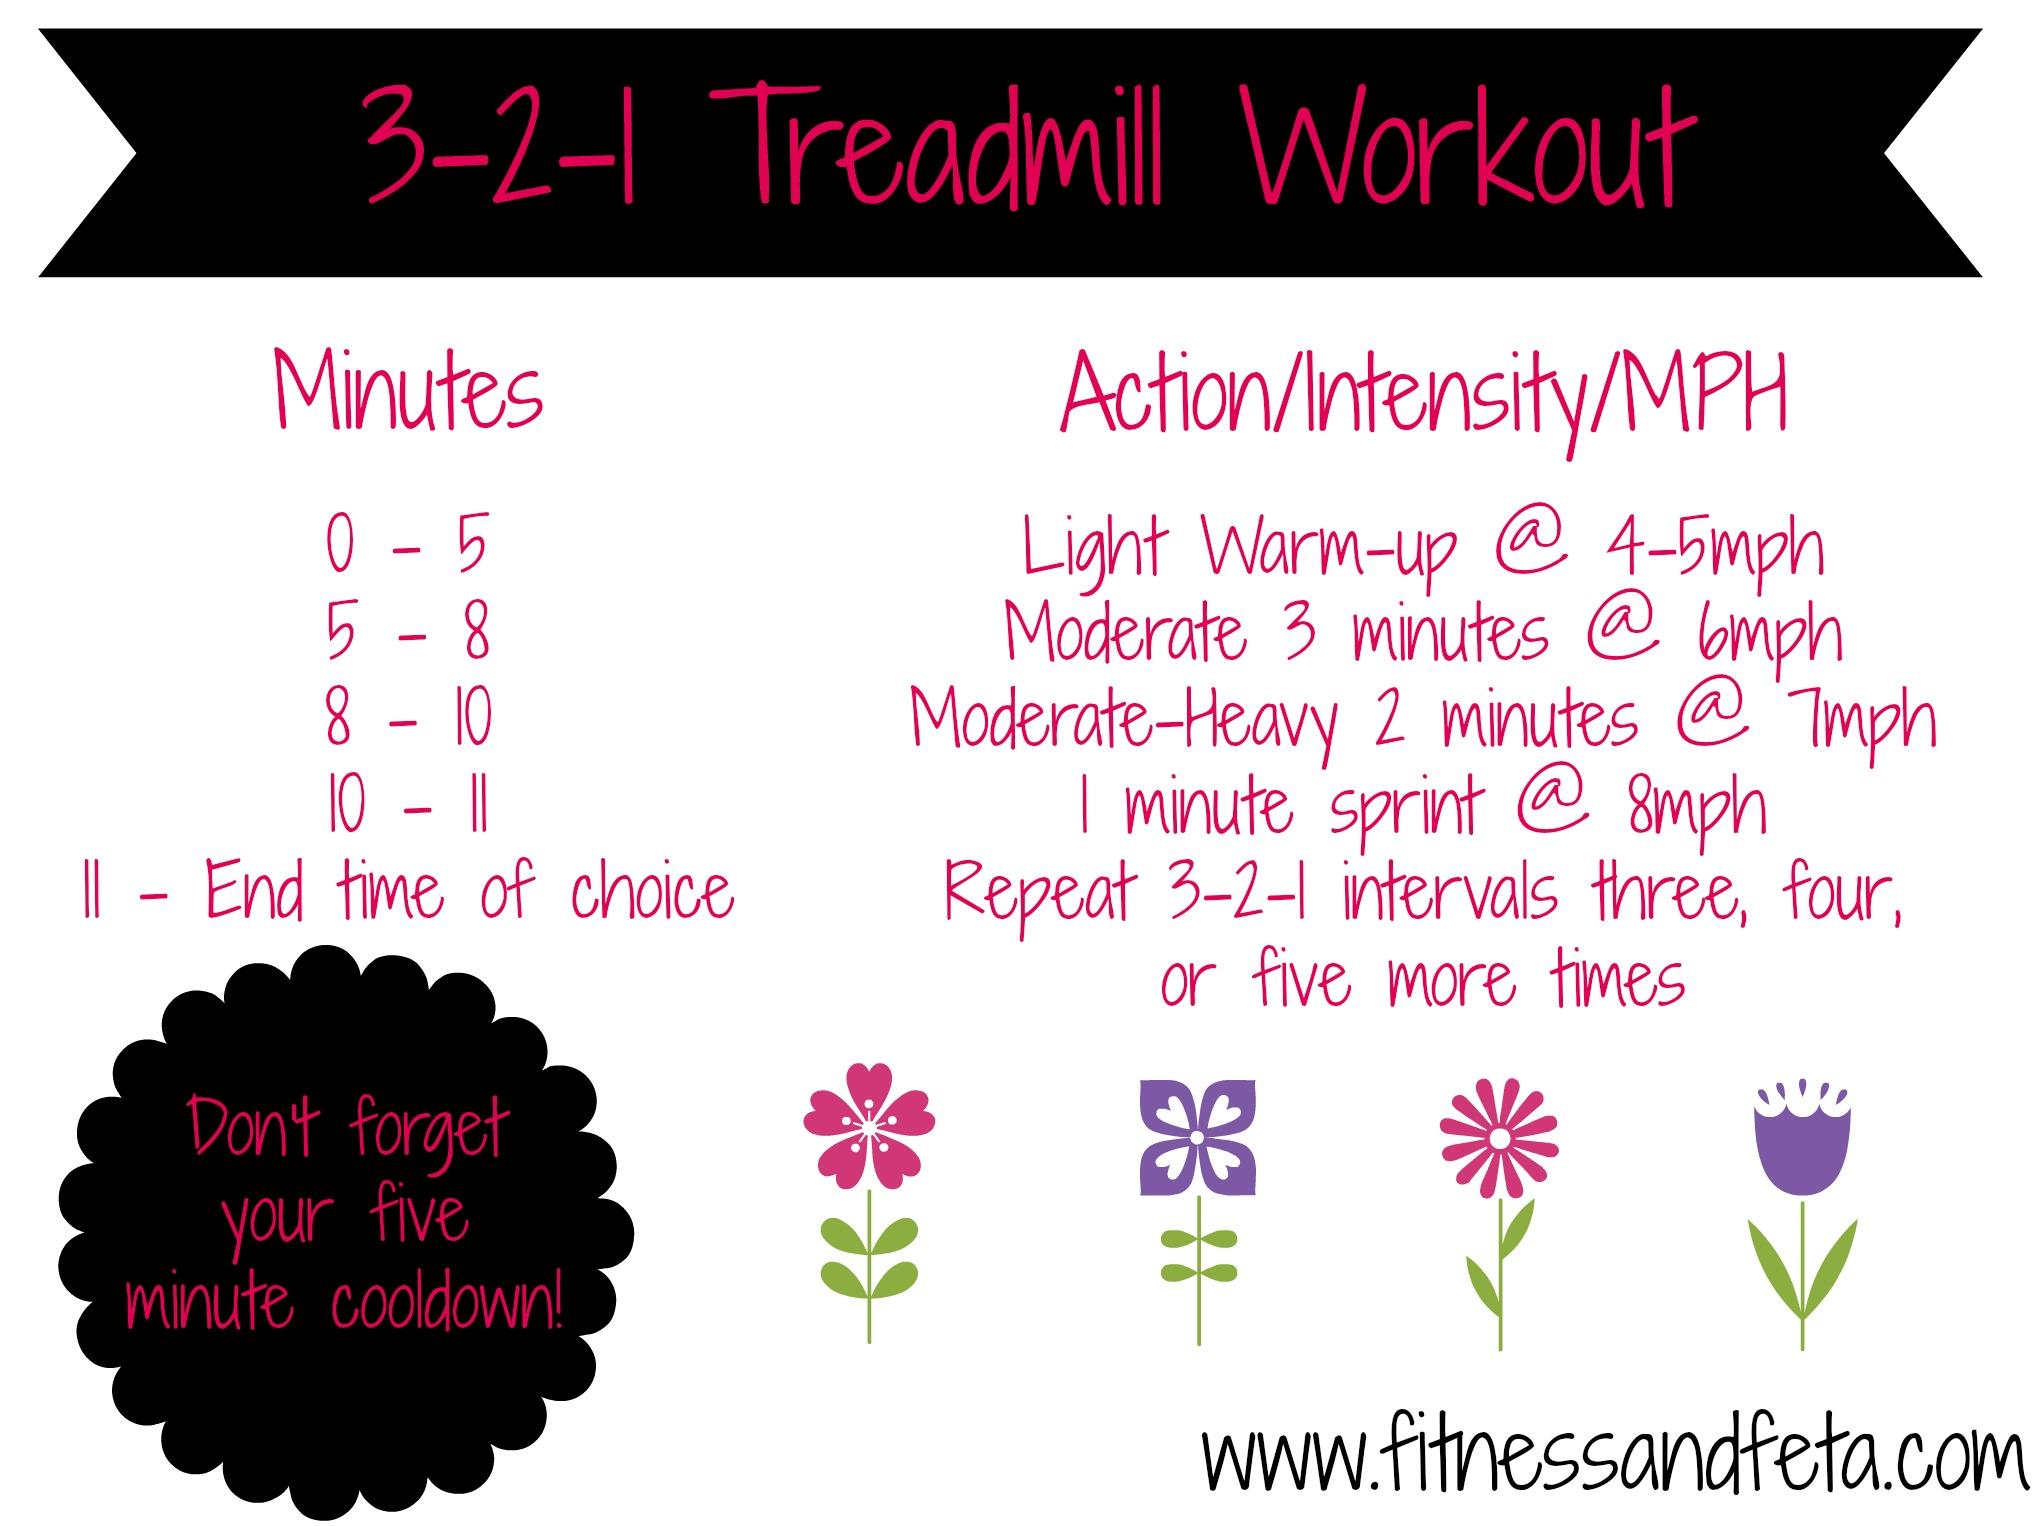 3-2-1 Treadmill Workout